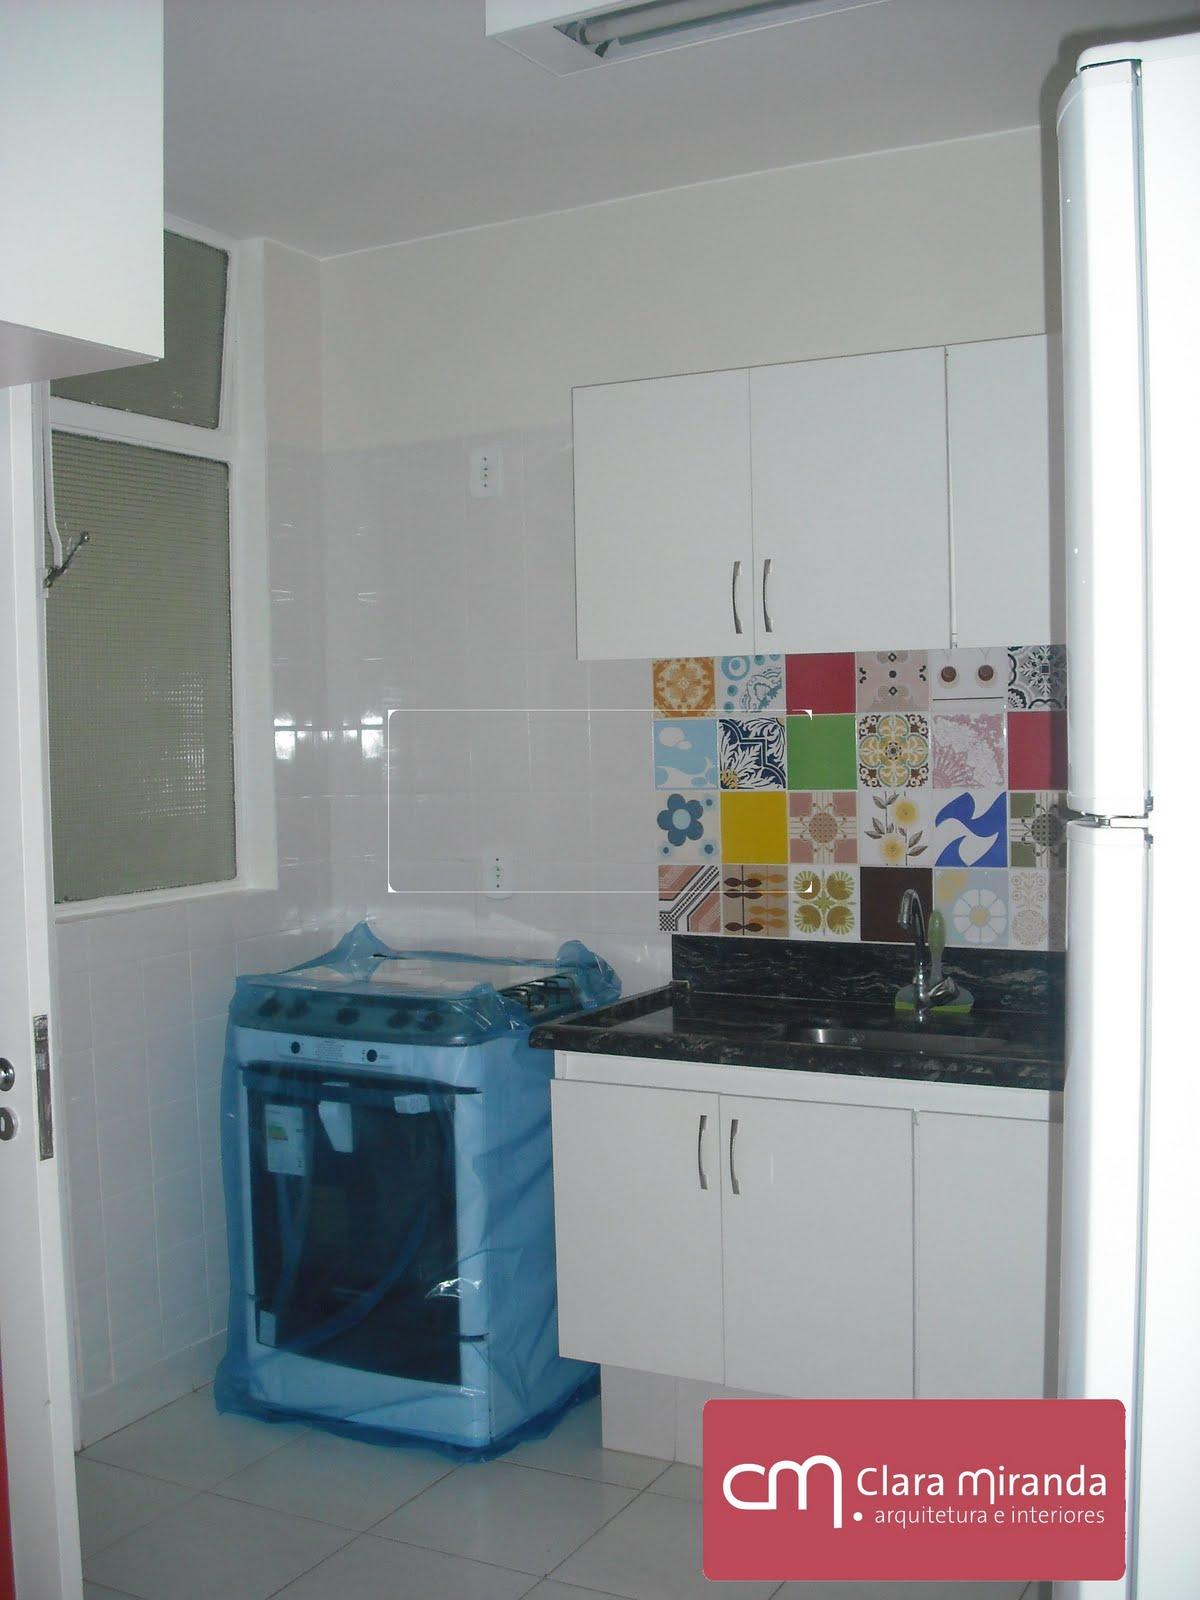 ARQ. CLARA MIRANDA: Cozinha e corredor #234B64 1200 1600